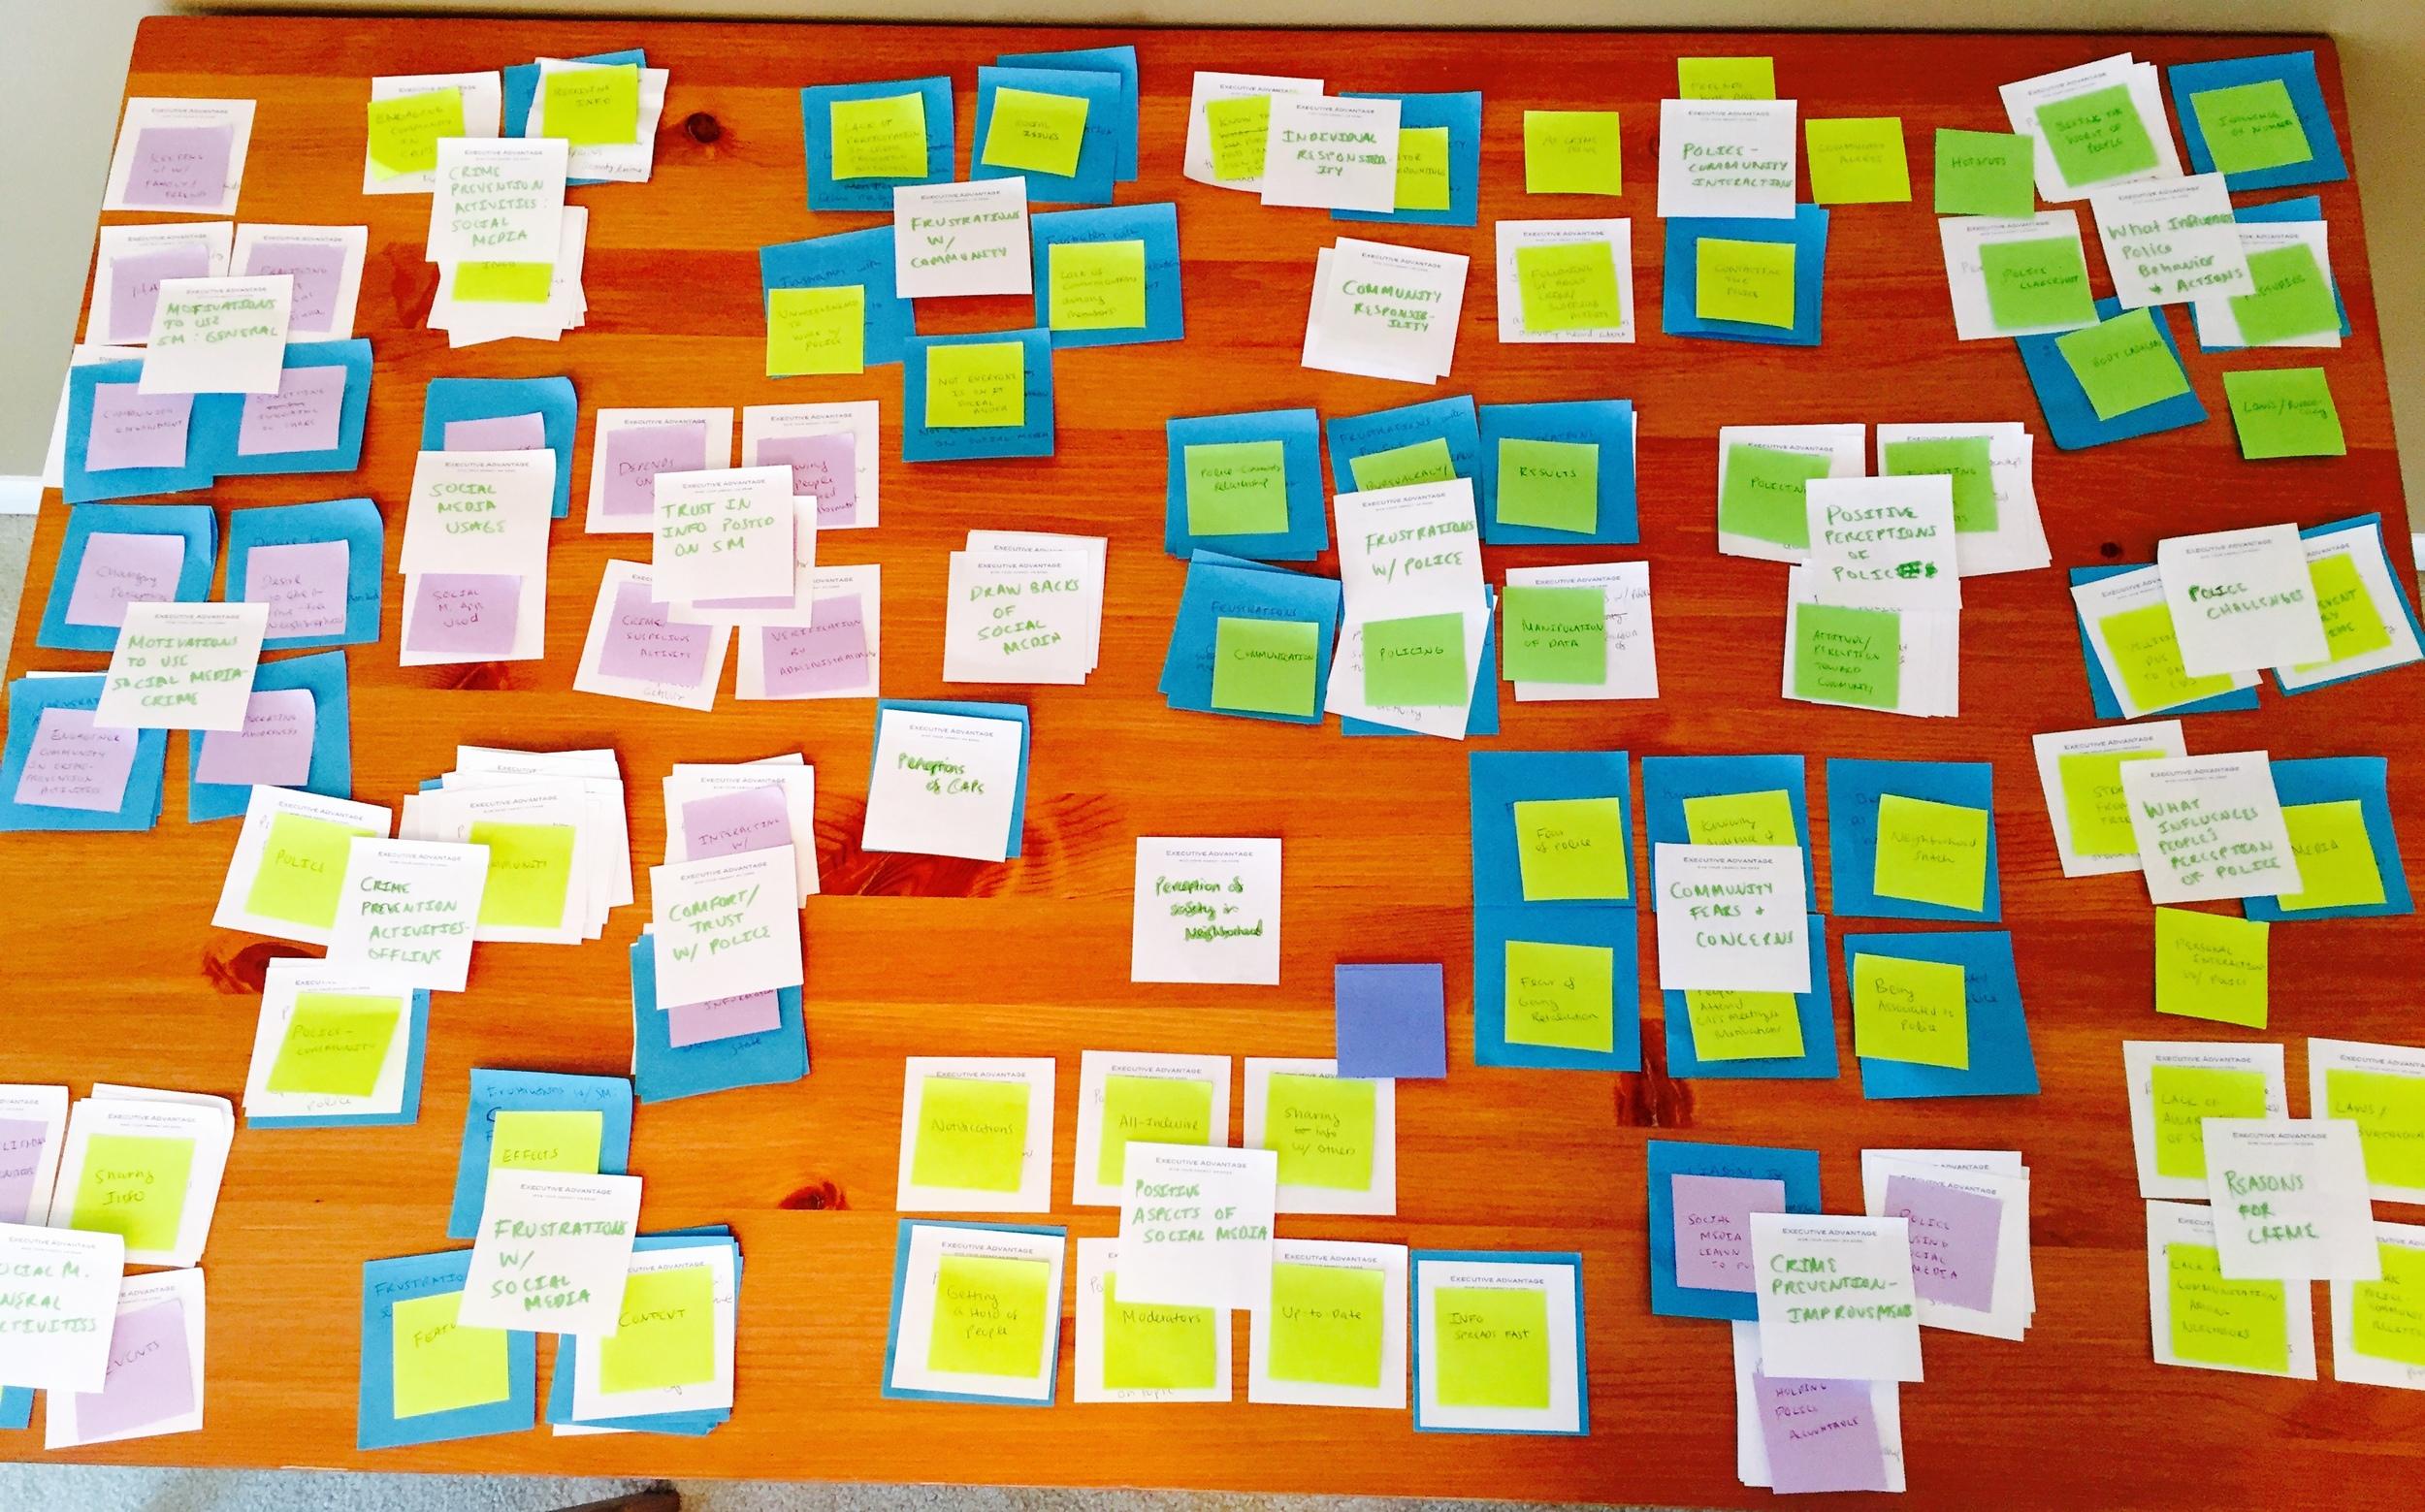 Qualitative Analysis: Affinity Diagram